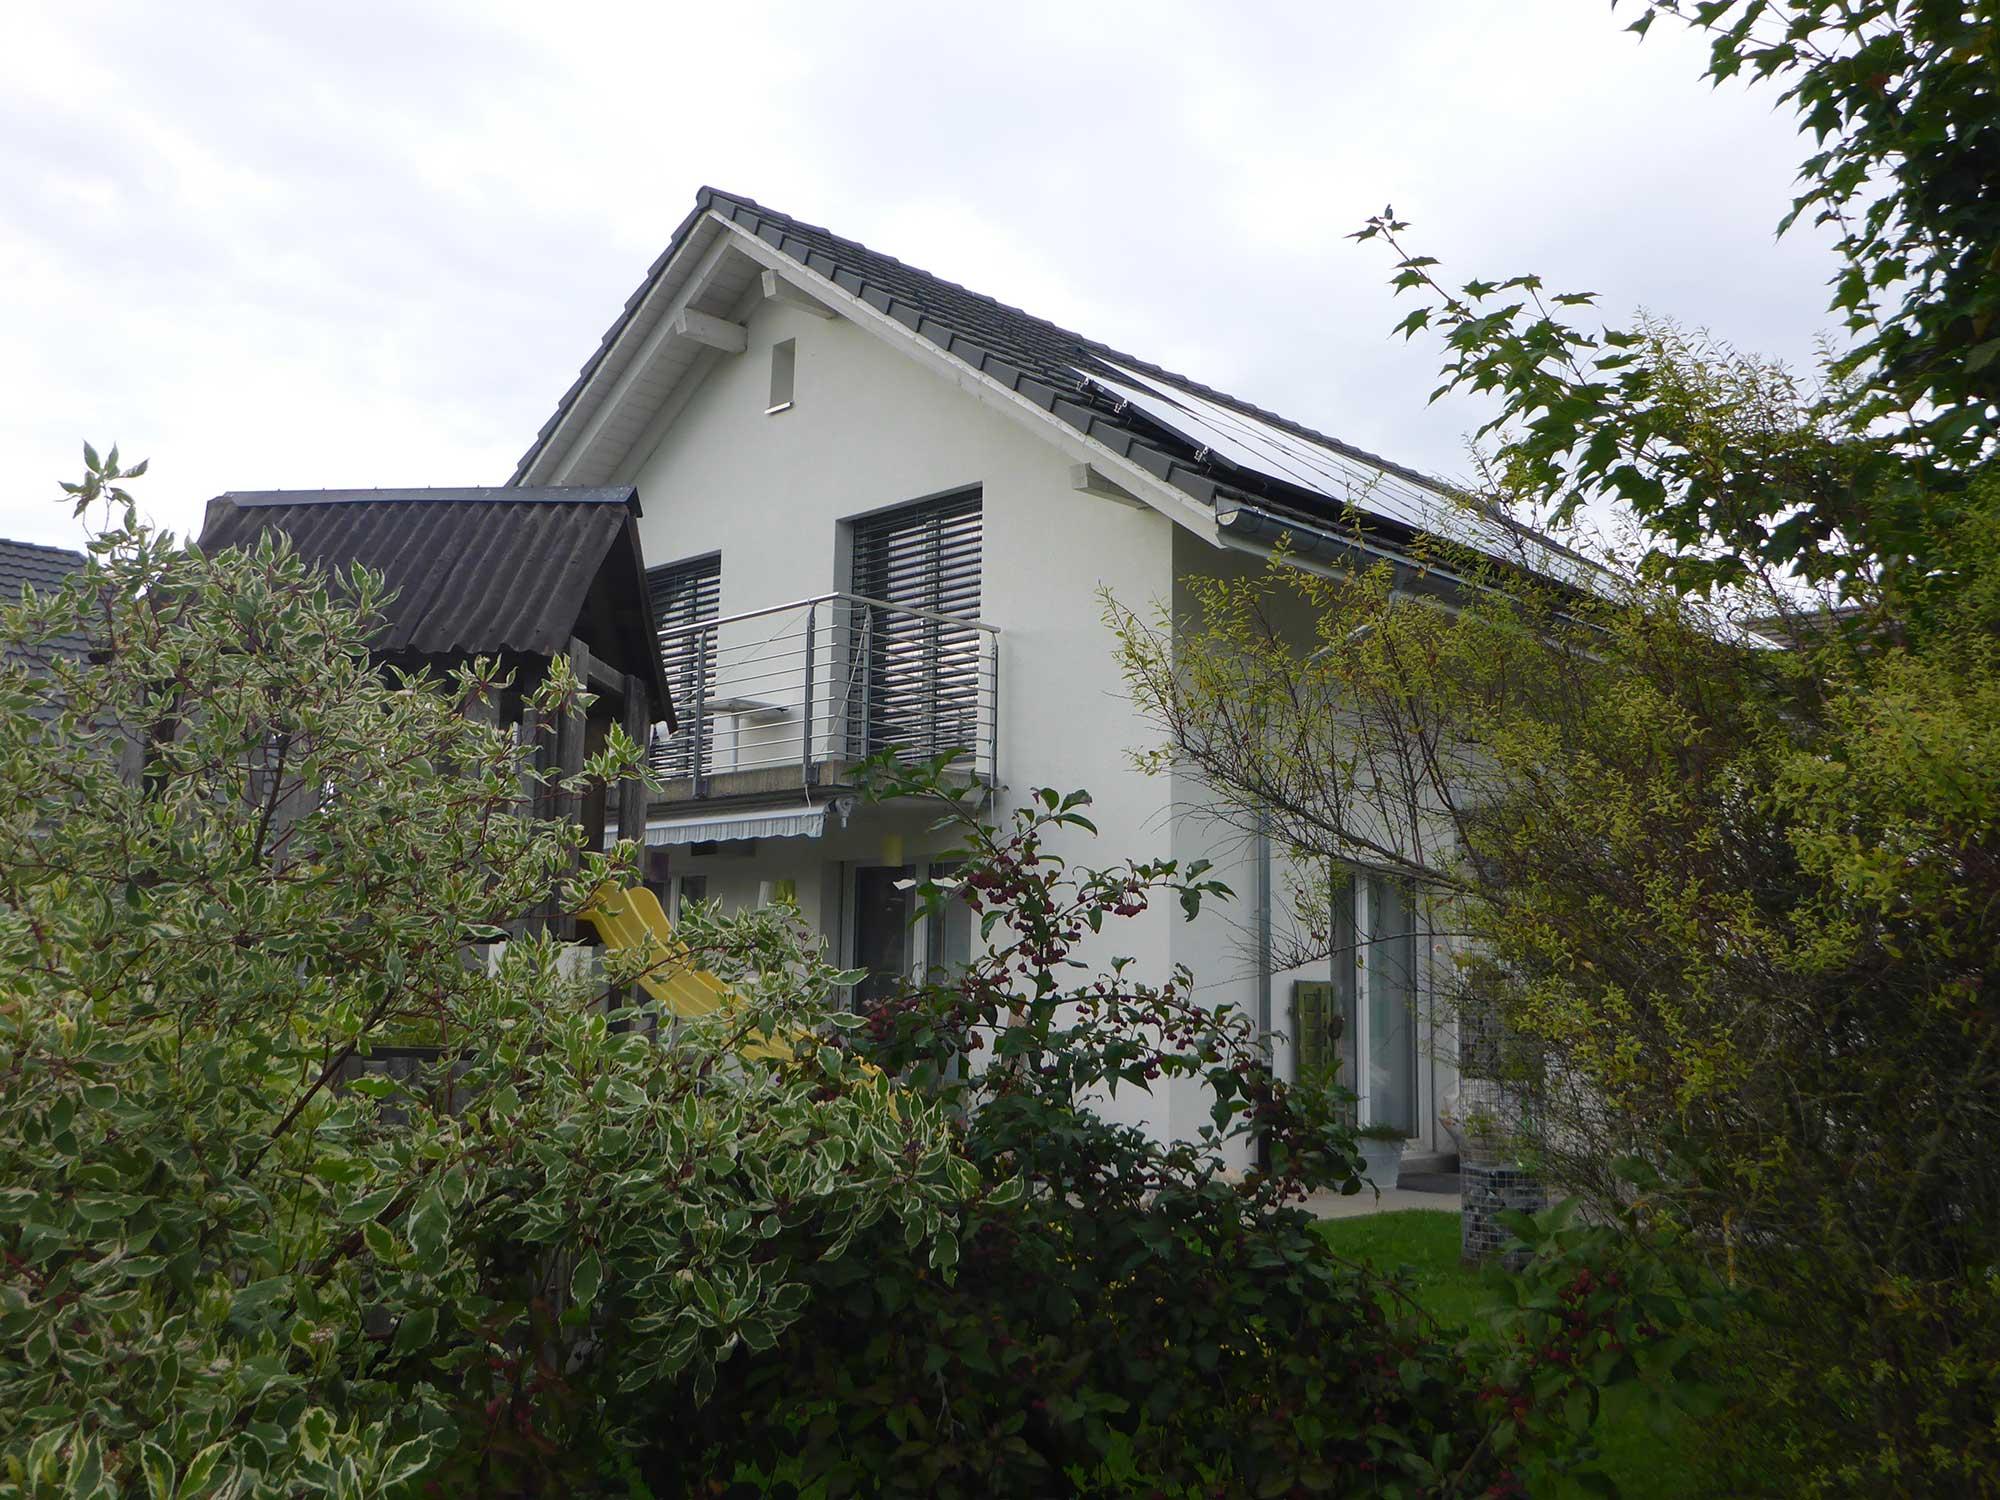 Musterhaus 3: 5½ - Zimmer - EFH mit 230 m2 Bgf